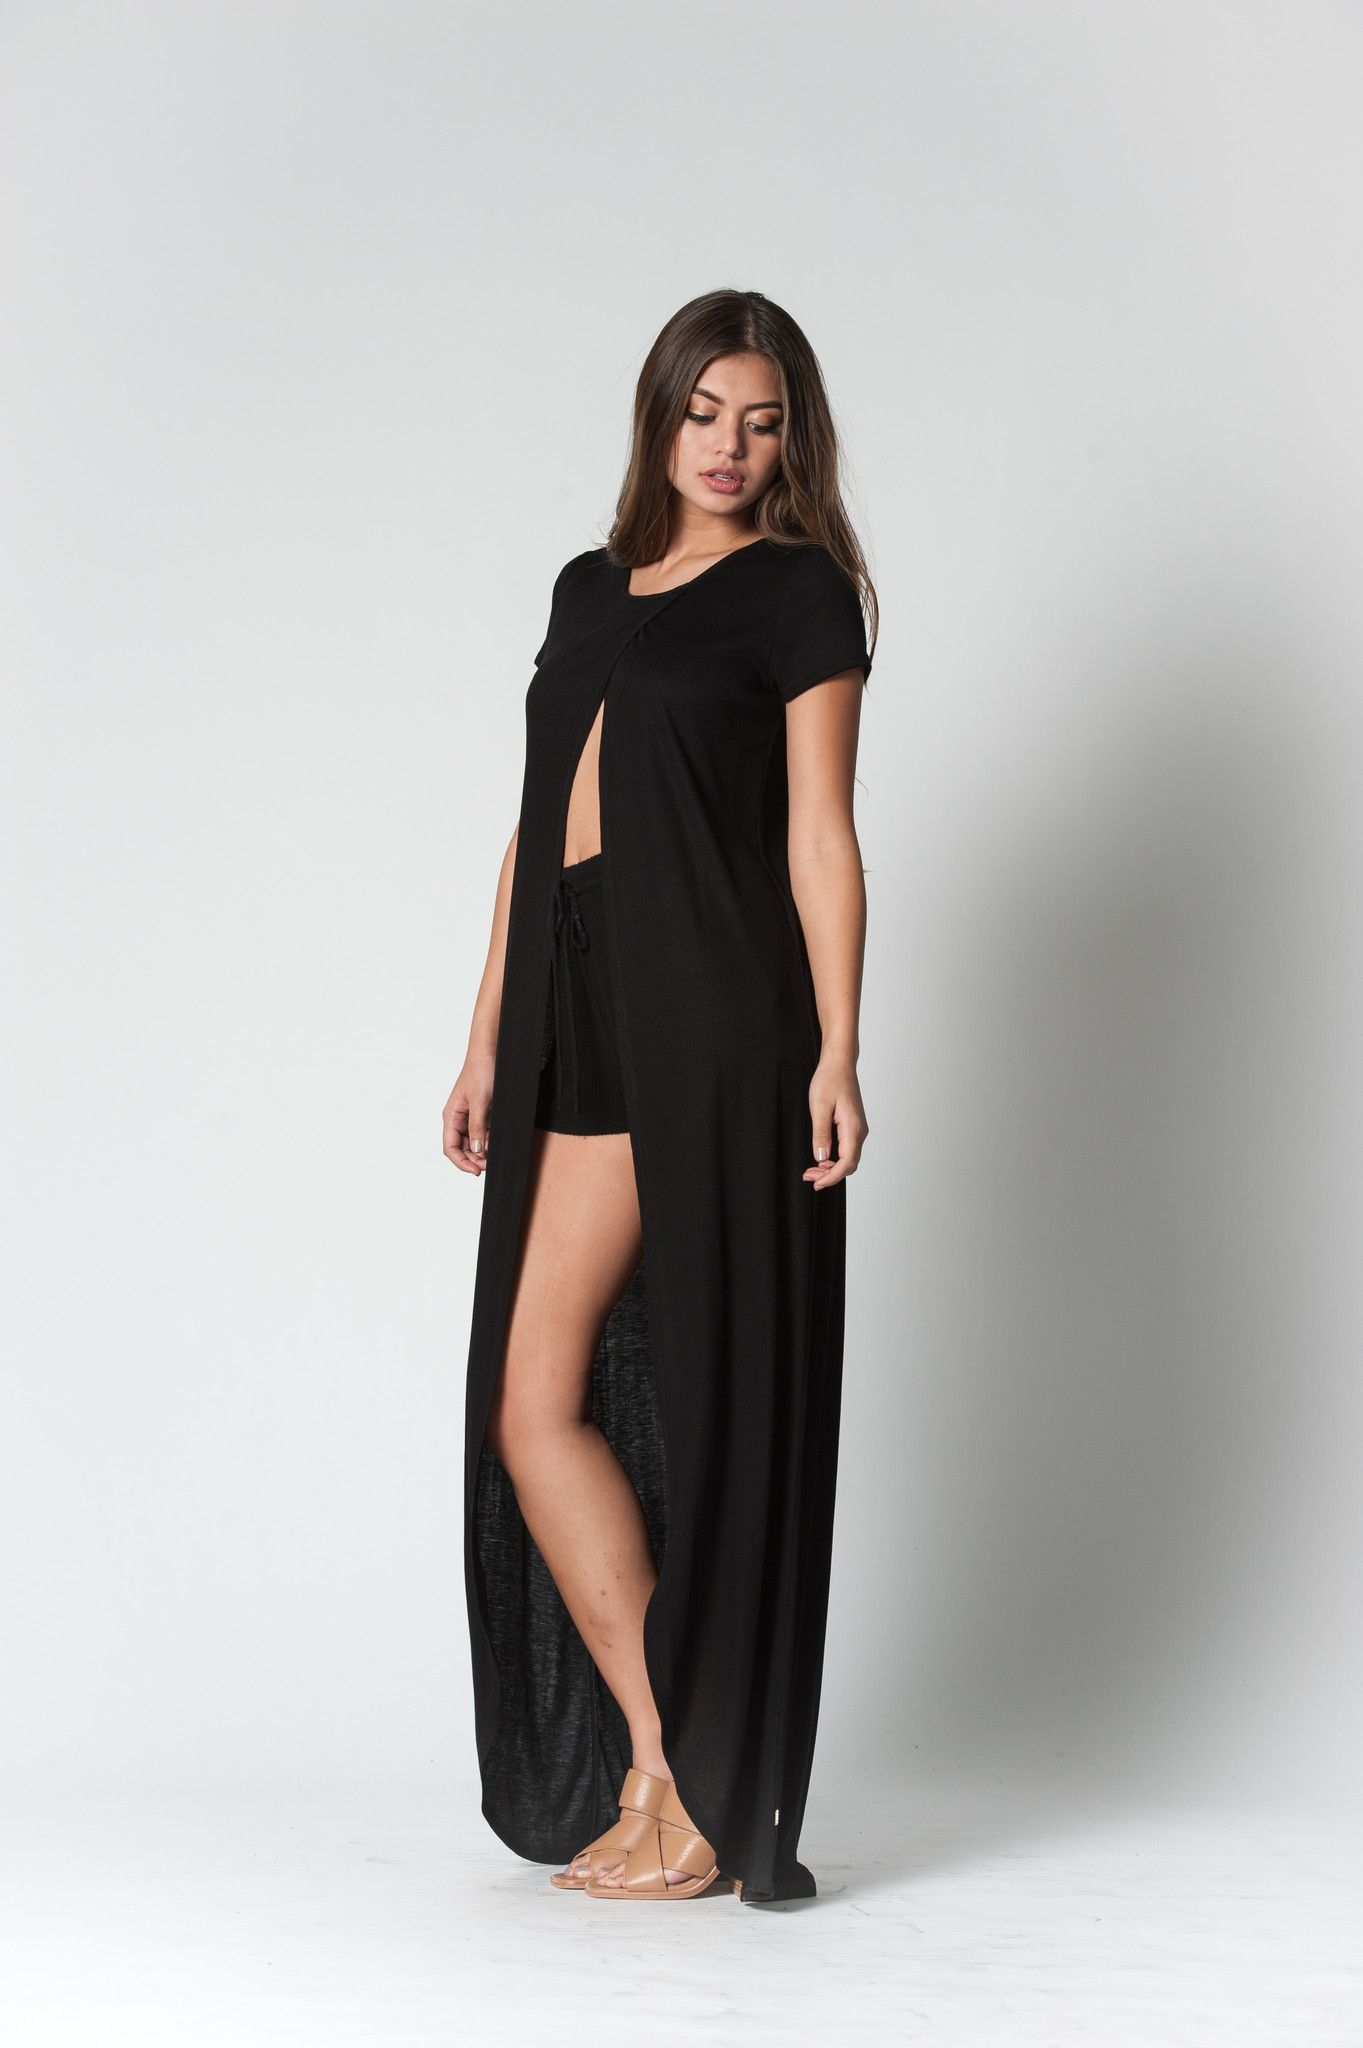 Short Sleeve Split Top in Black